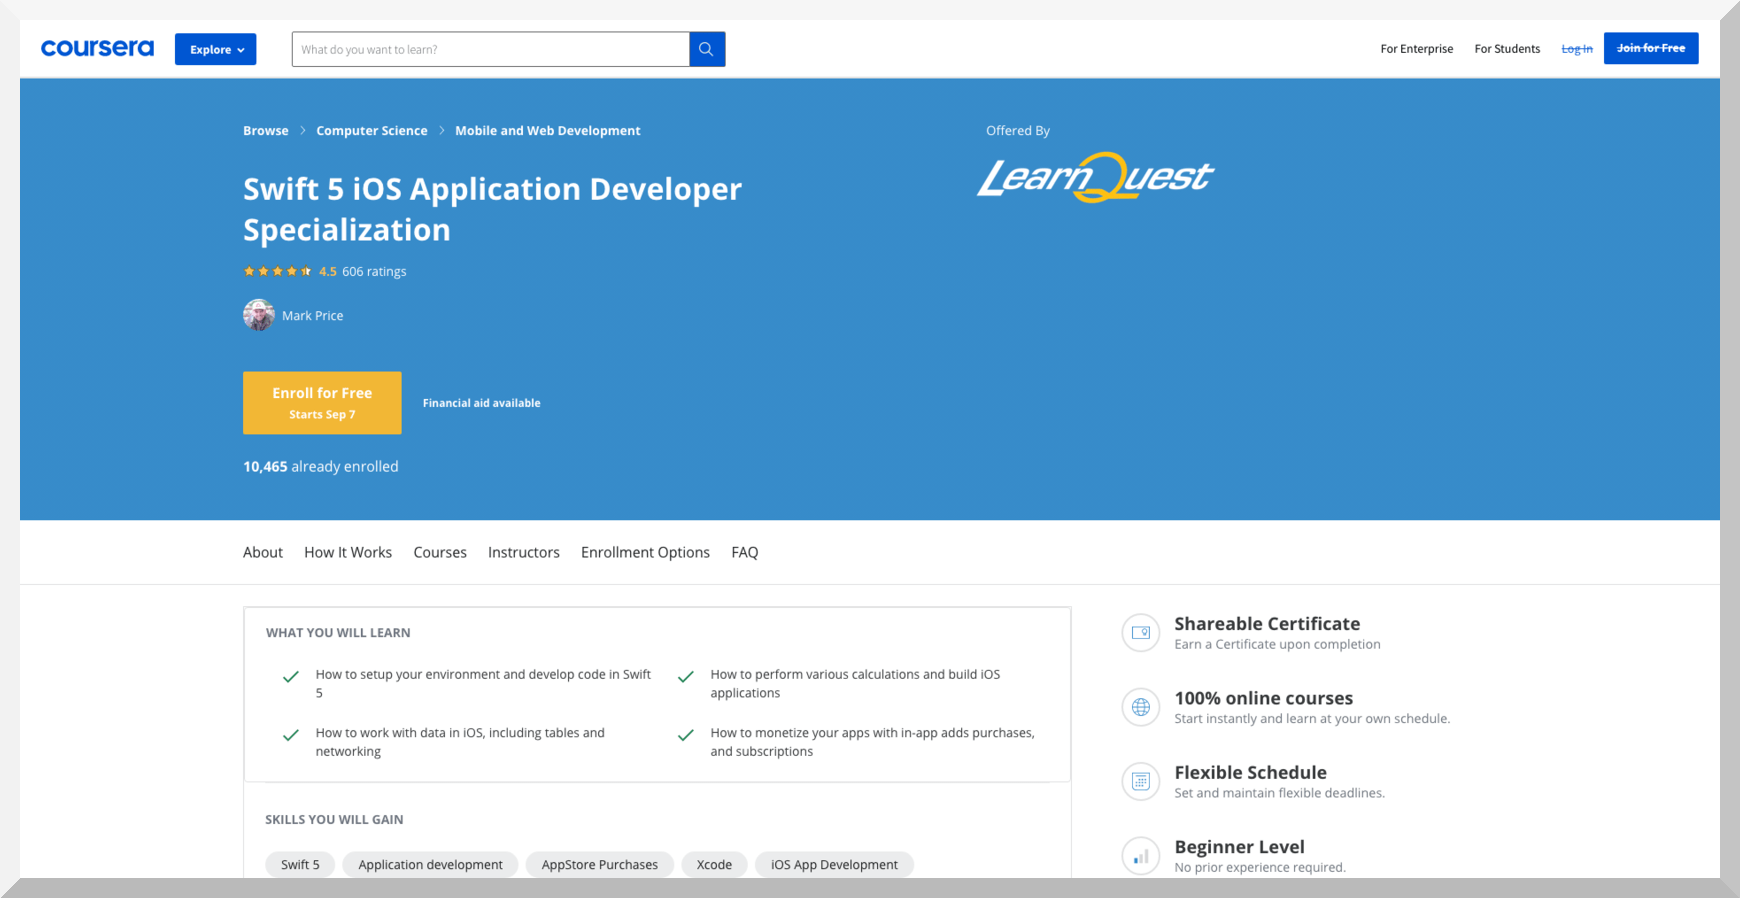 Swift 5 iOS Application Developer Specialization by Learn Quest – Coursera